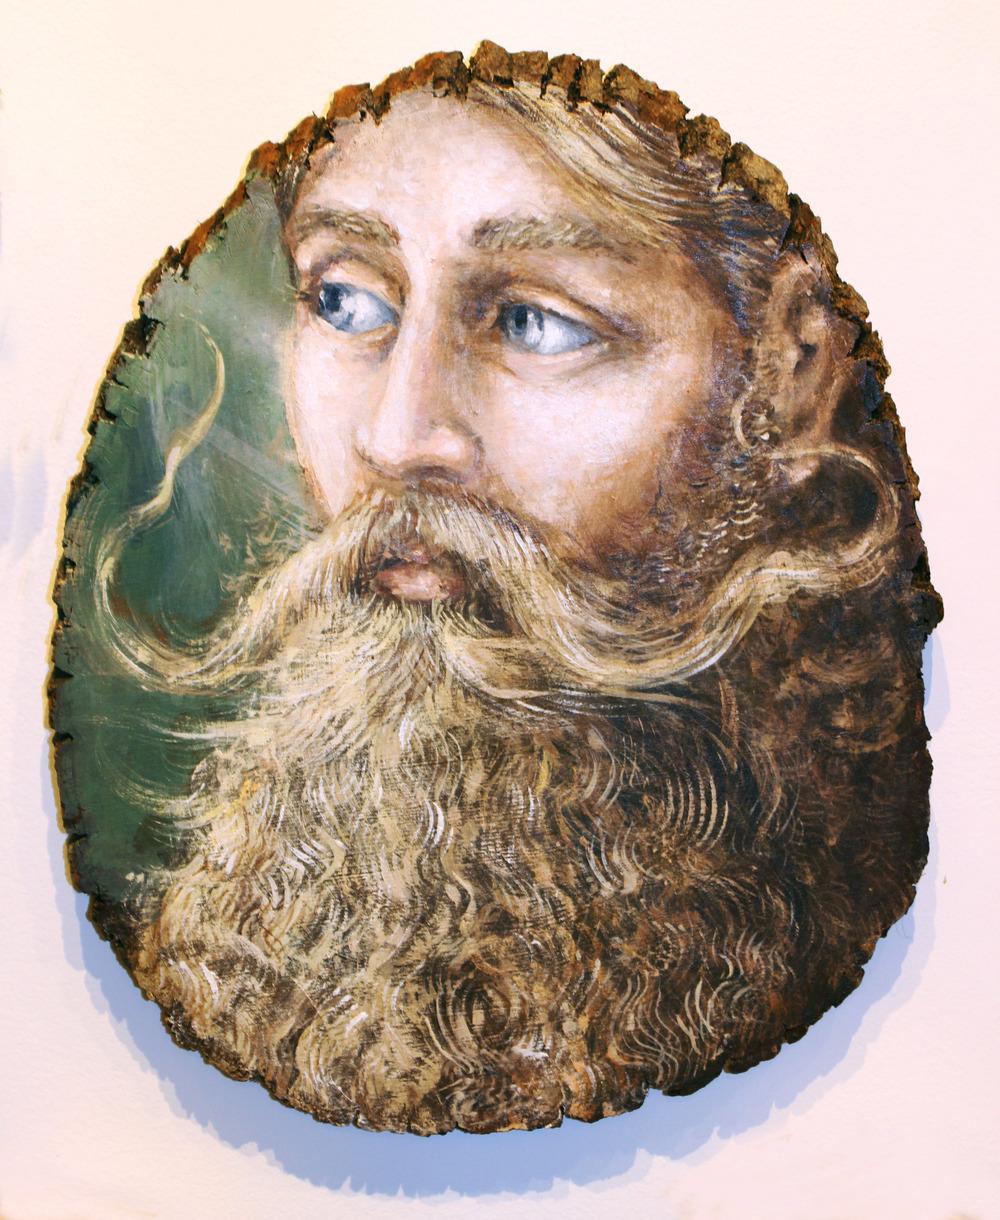 Simon's Longest Softest Beard